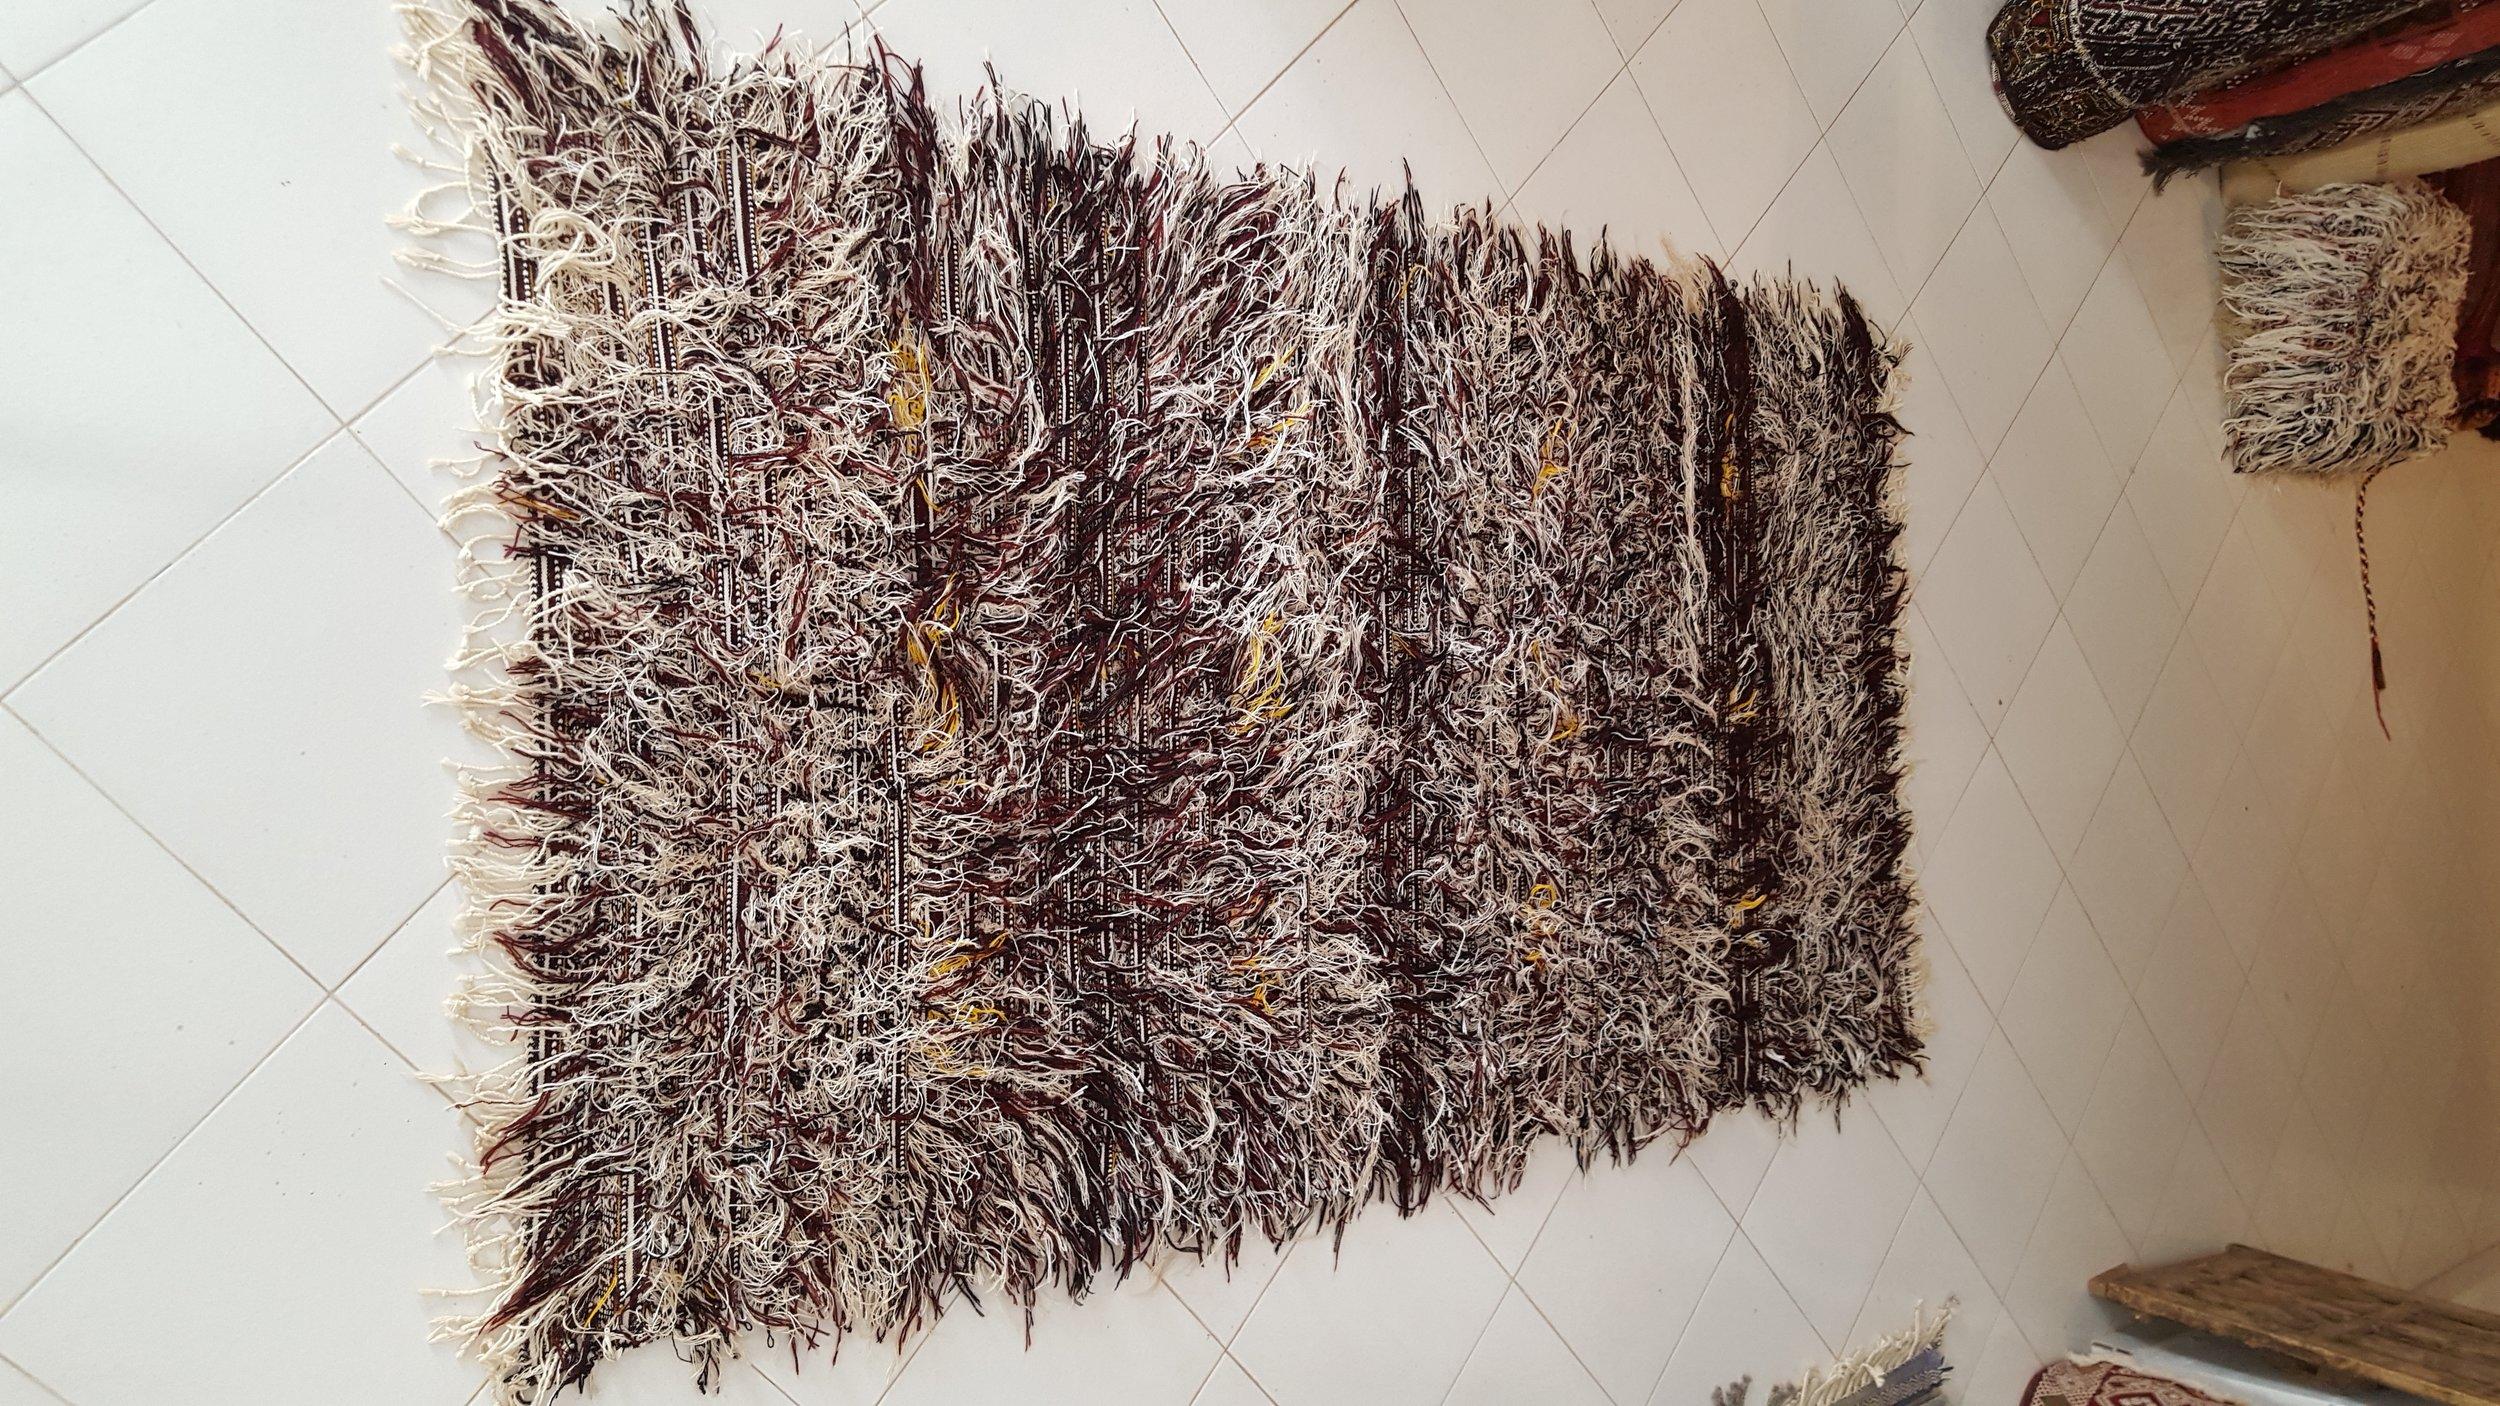 beni Ouarain Wedding Blanket - Moroccan berber carpets - Rare Moroccan Wedding Blanket.jpg